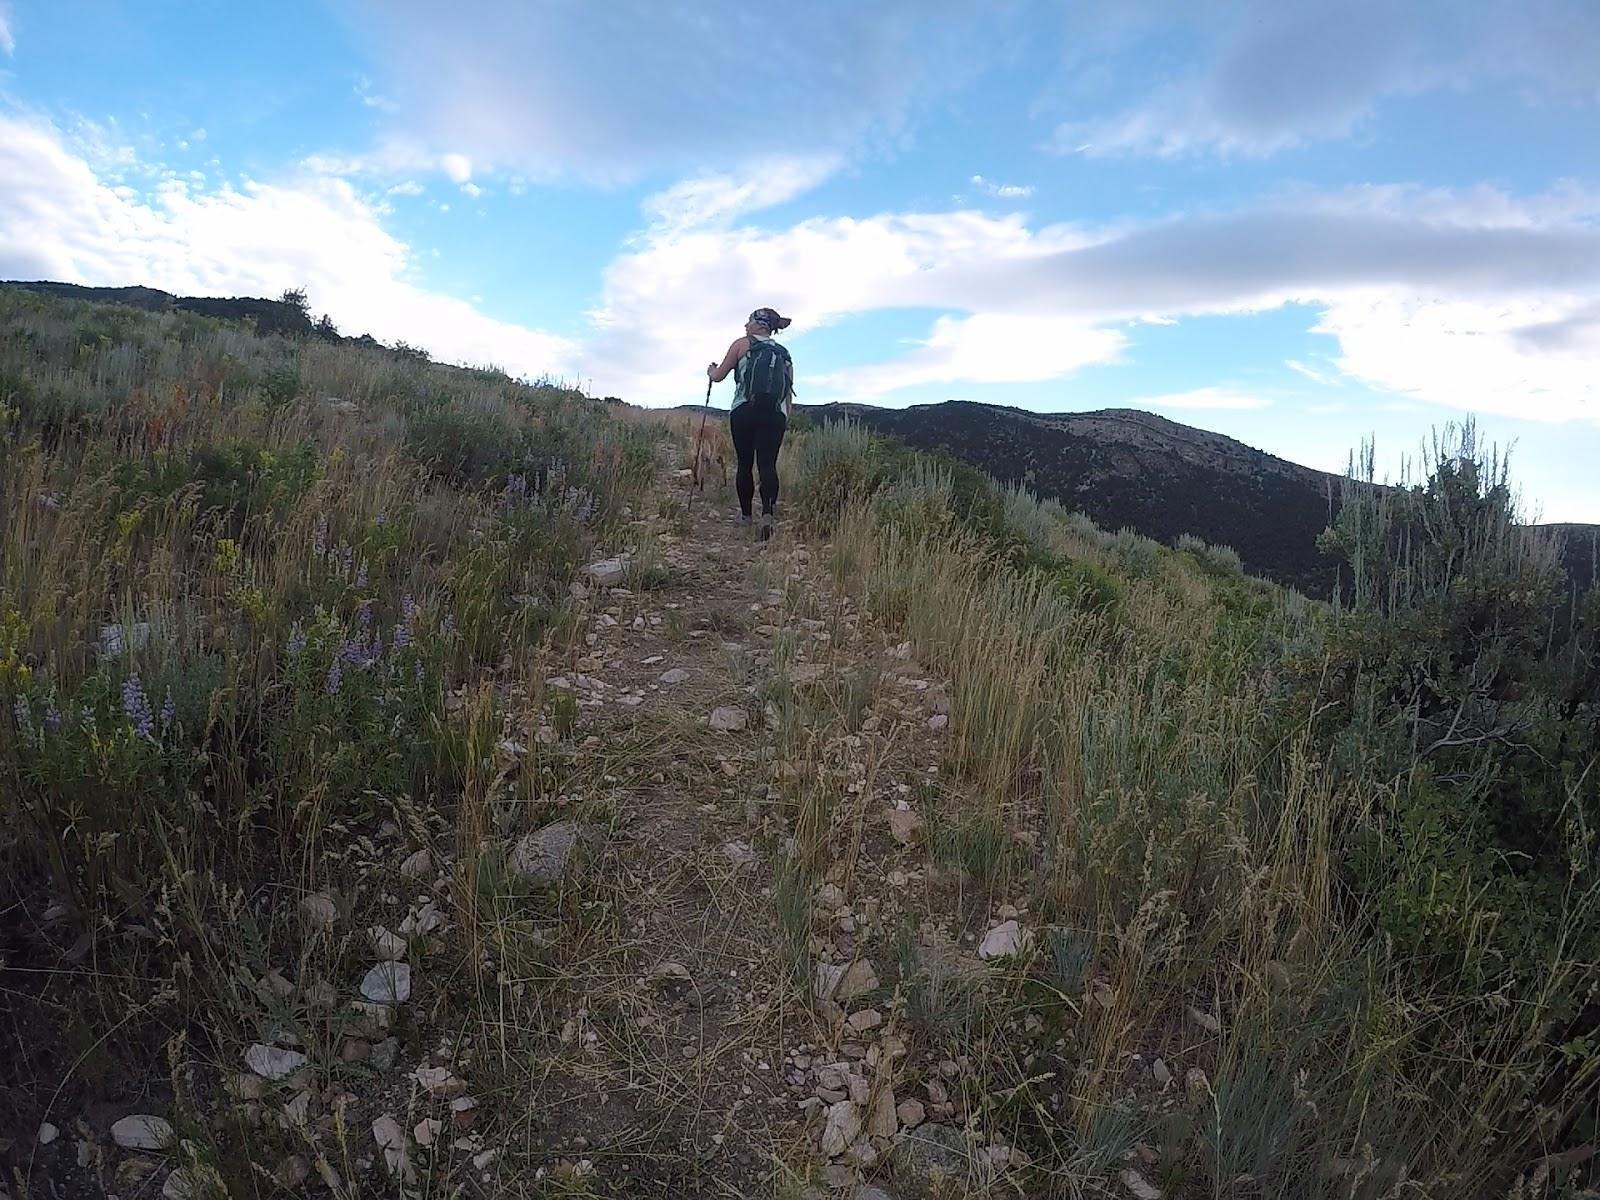 Hiking to Bull Mountain via Bull Flat, Box Elder County High Point